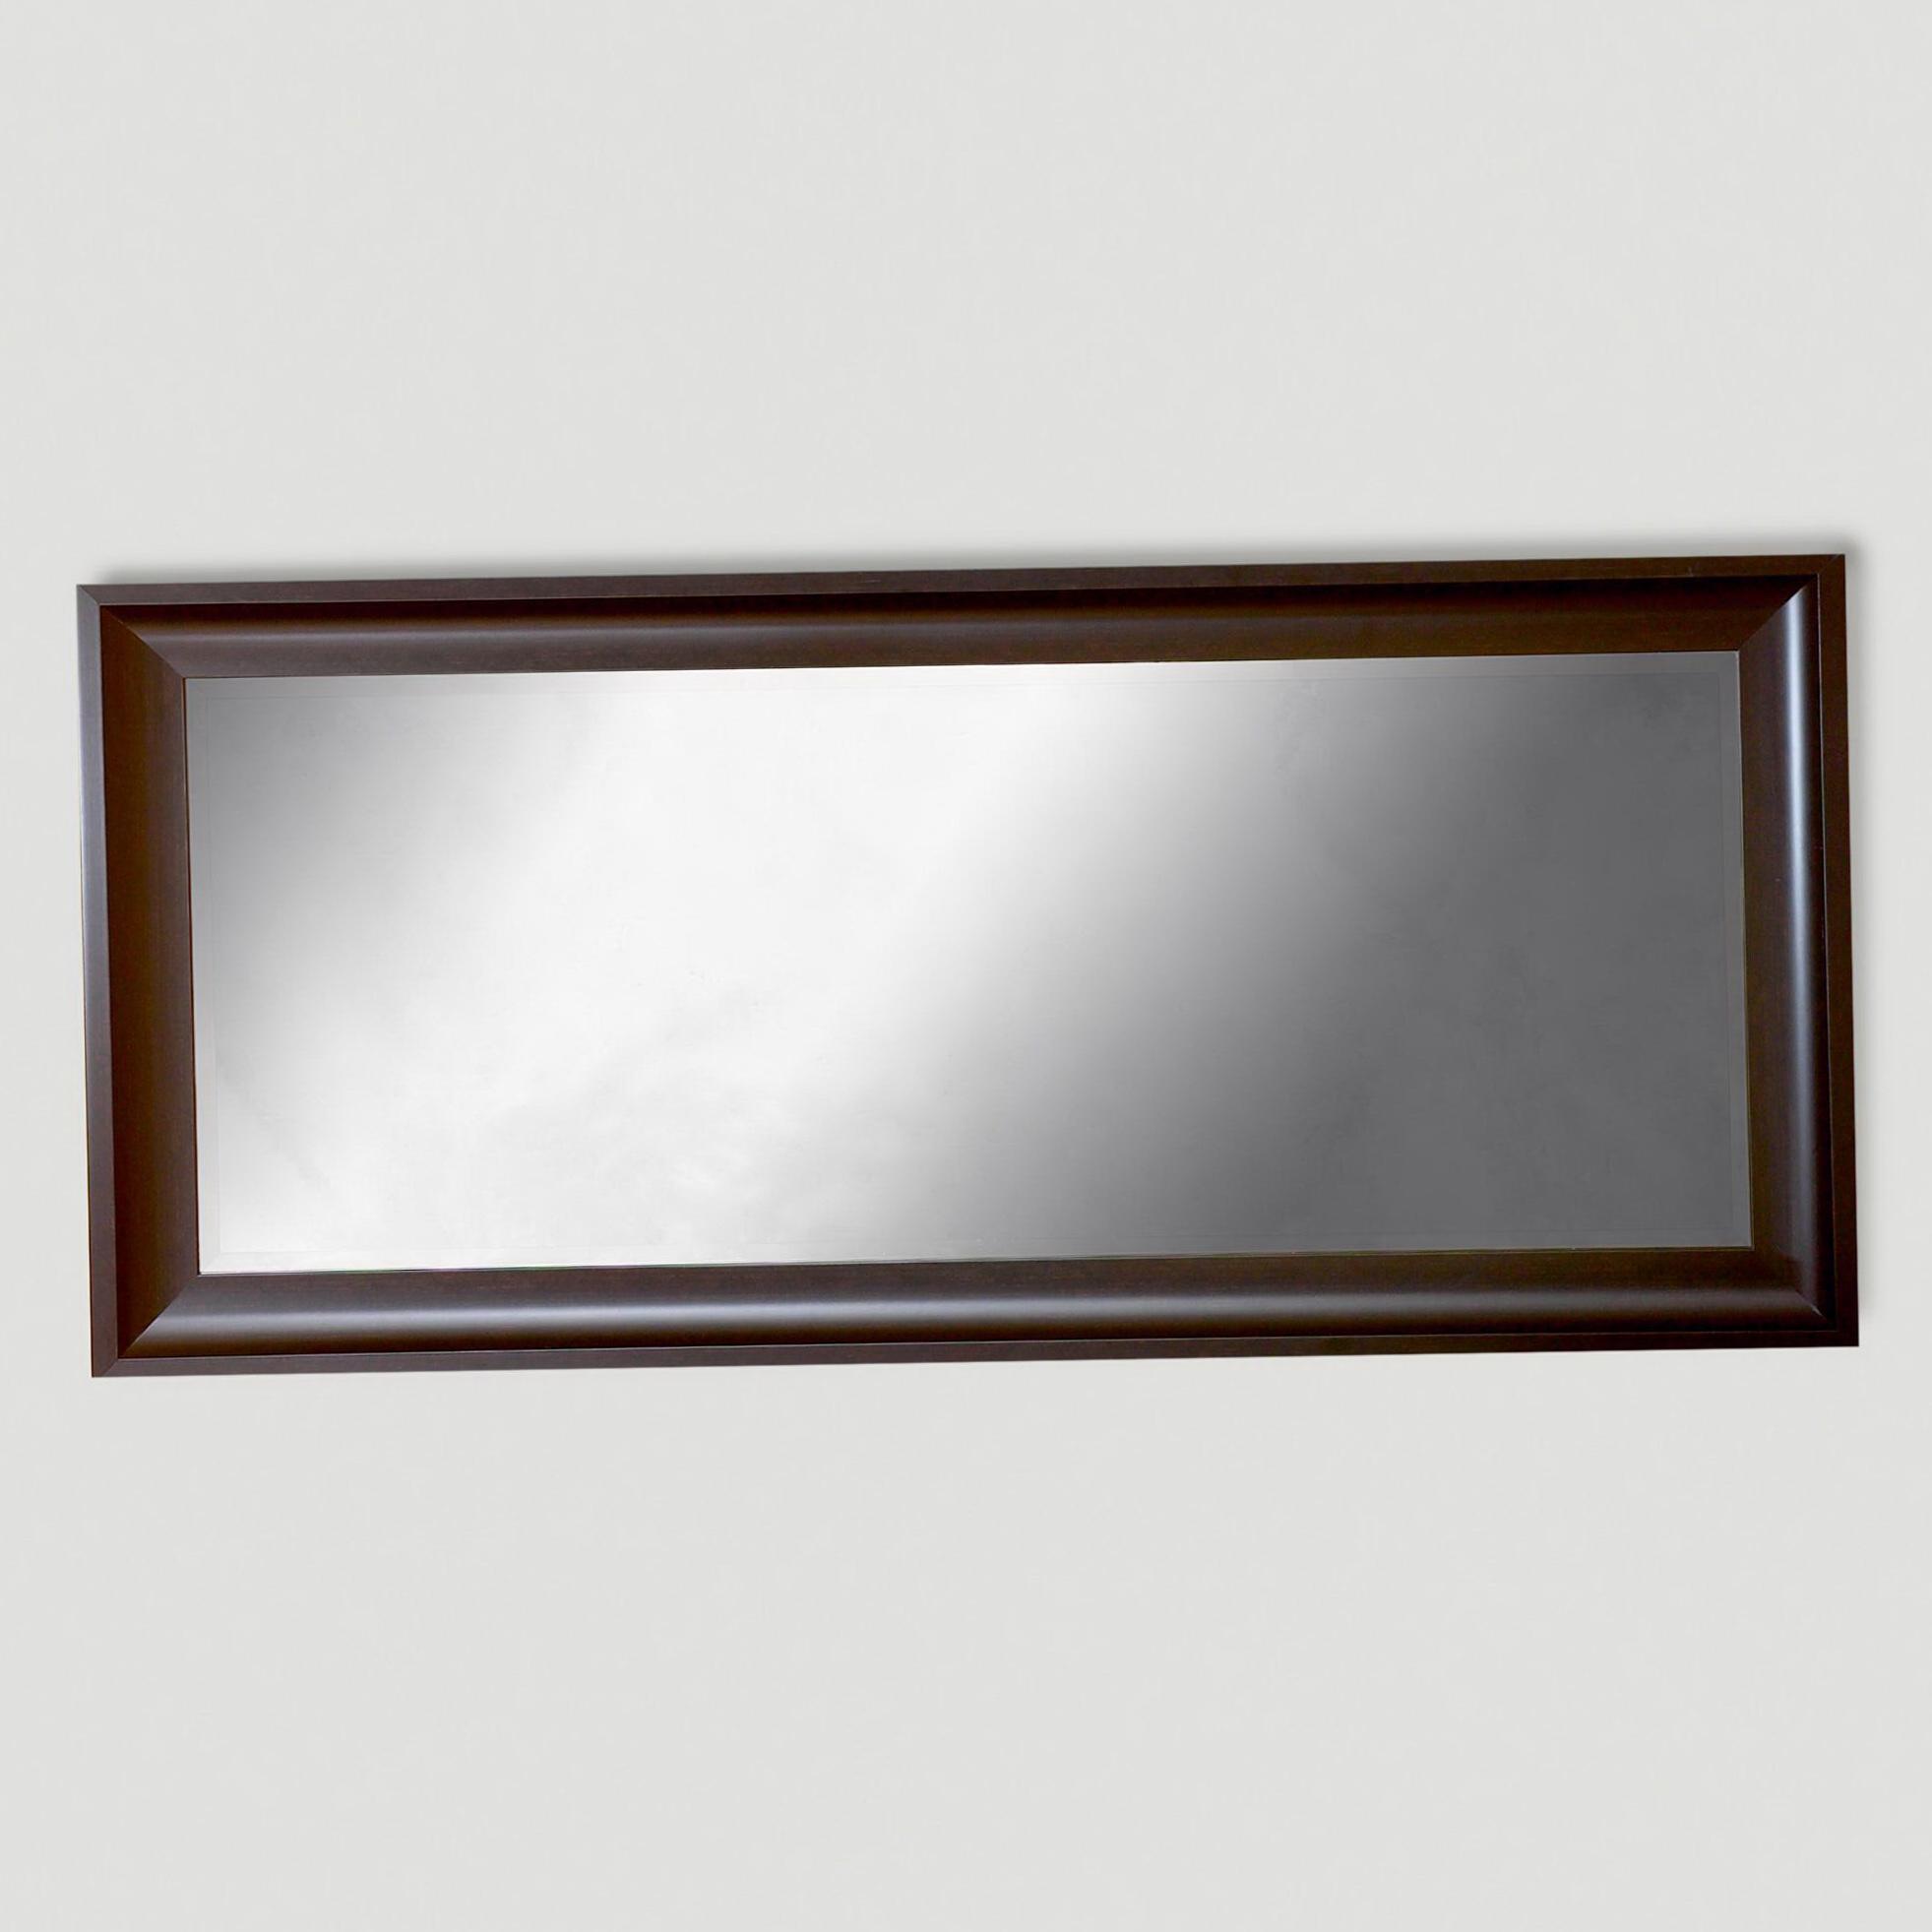 Decorative Wall Mirrors Ikea Home Design Ideas